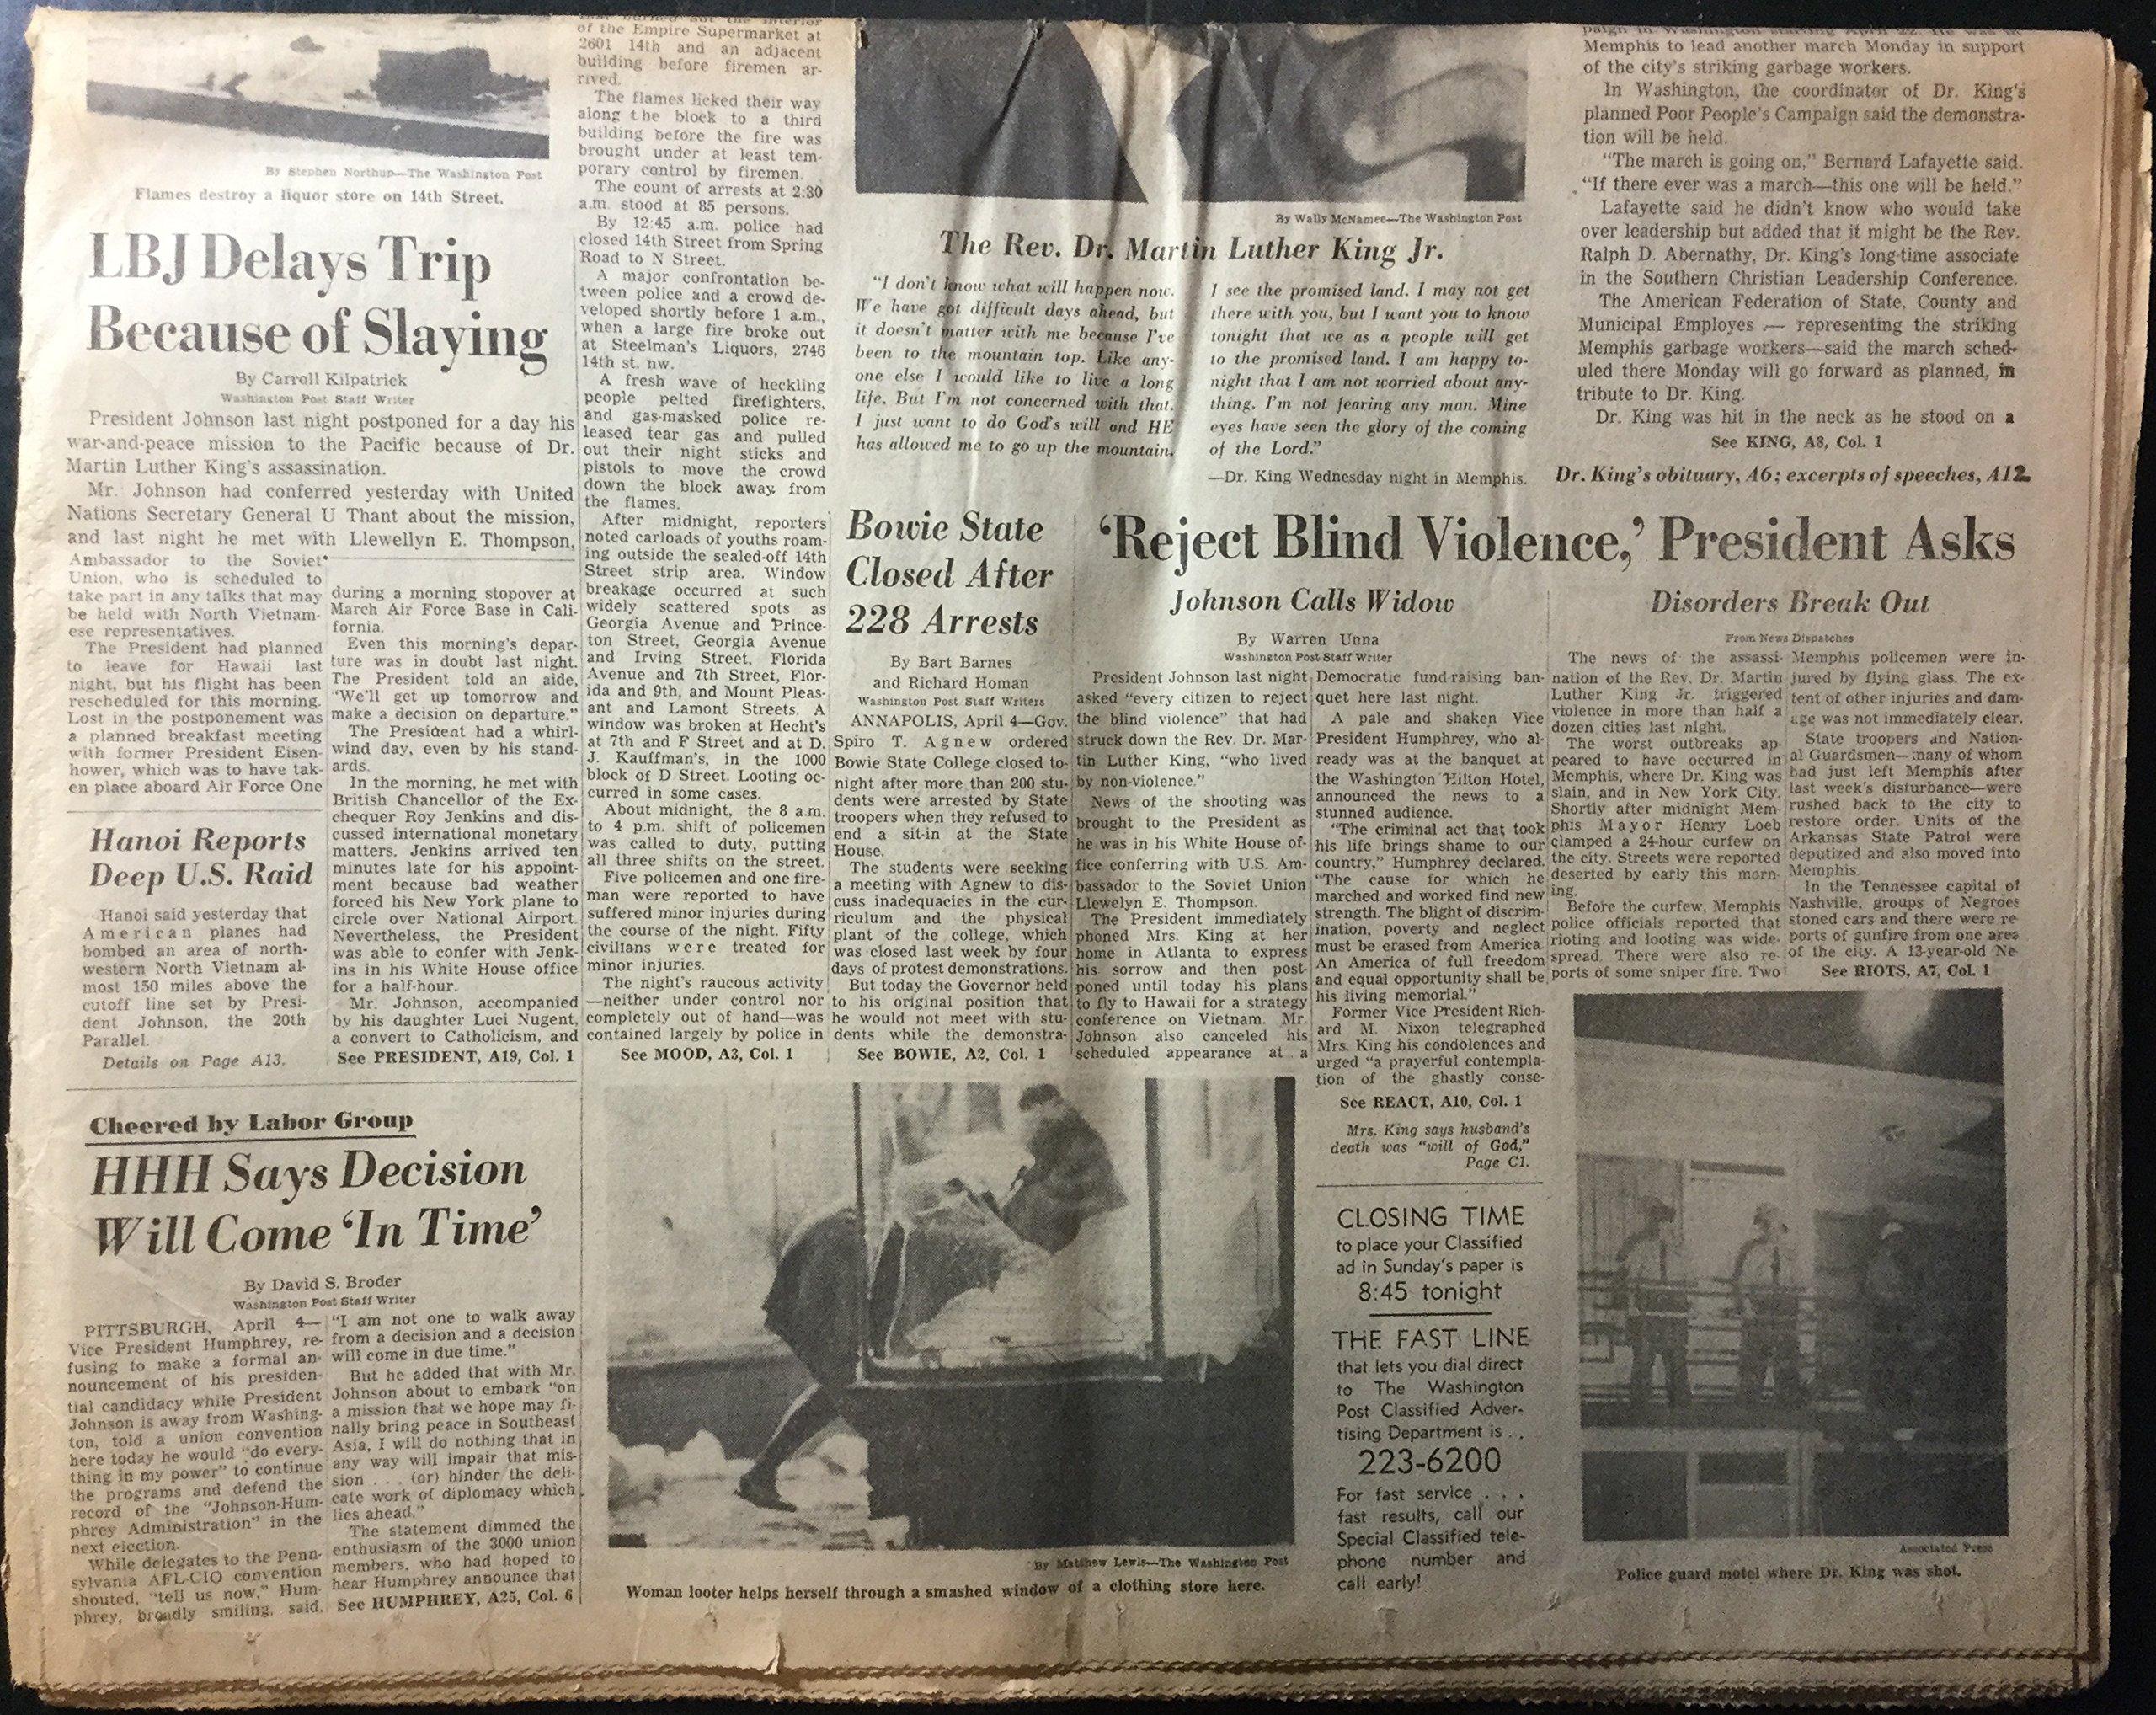 The Washington Post (newspaper), Friday, April 5, 1968